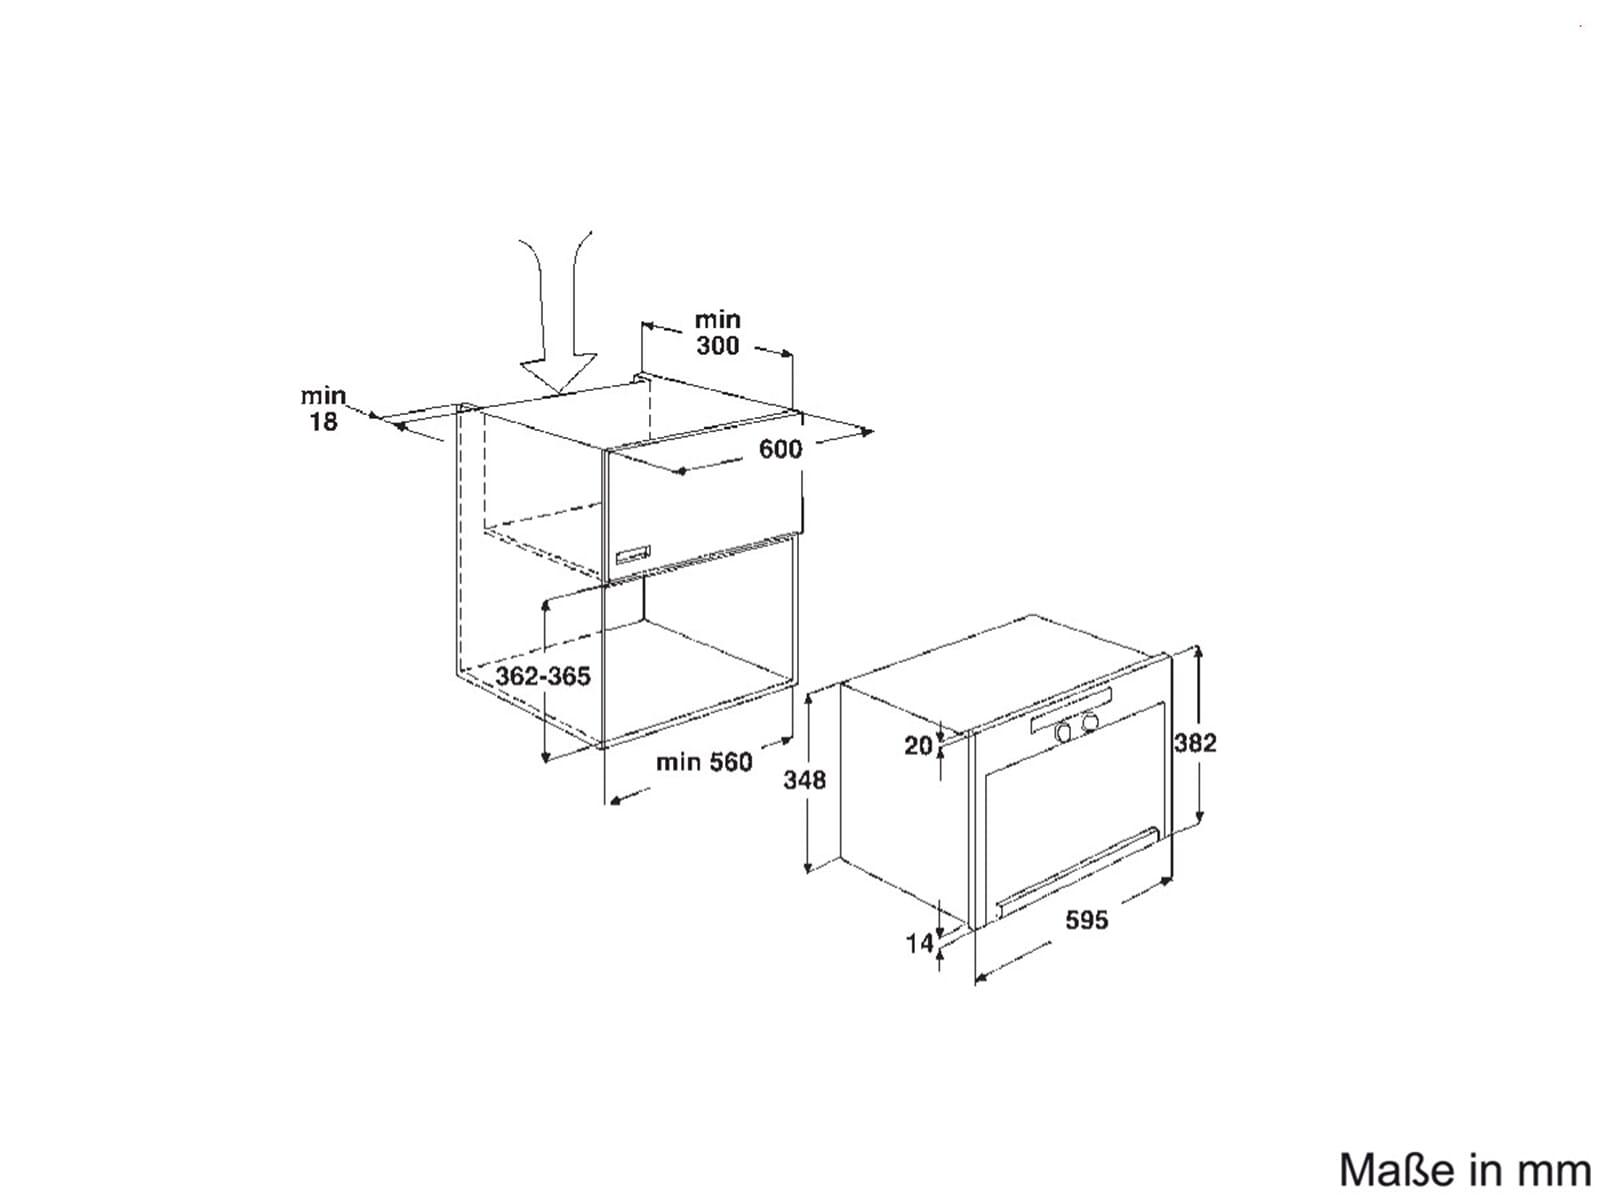 bauknecht emwp 9238 pt einbau mikrowelle edelstahl microwelle herd ofen ebay. Black Bedroom Furniture Sets. Home Design Ideas